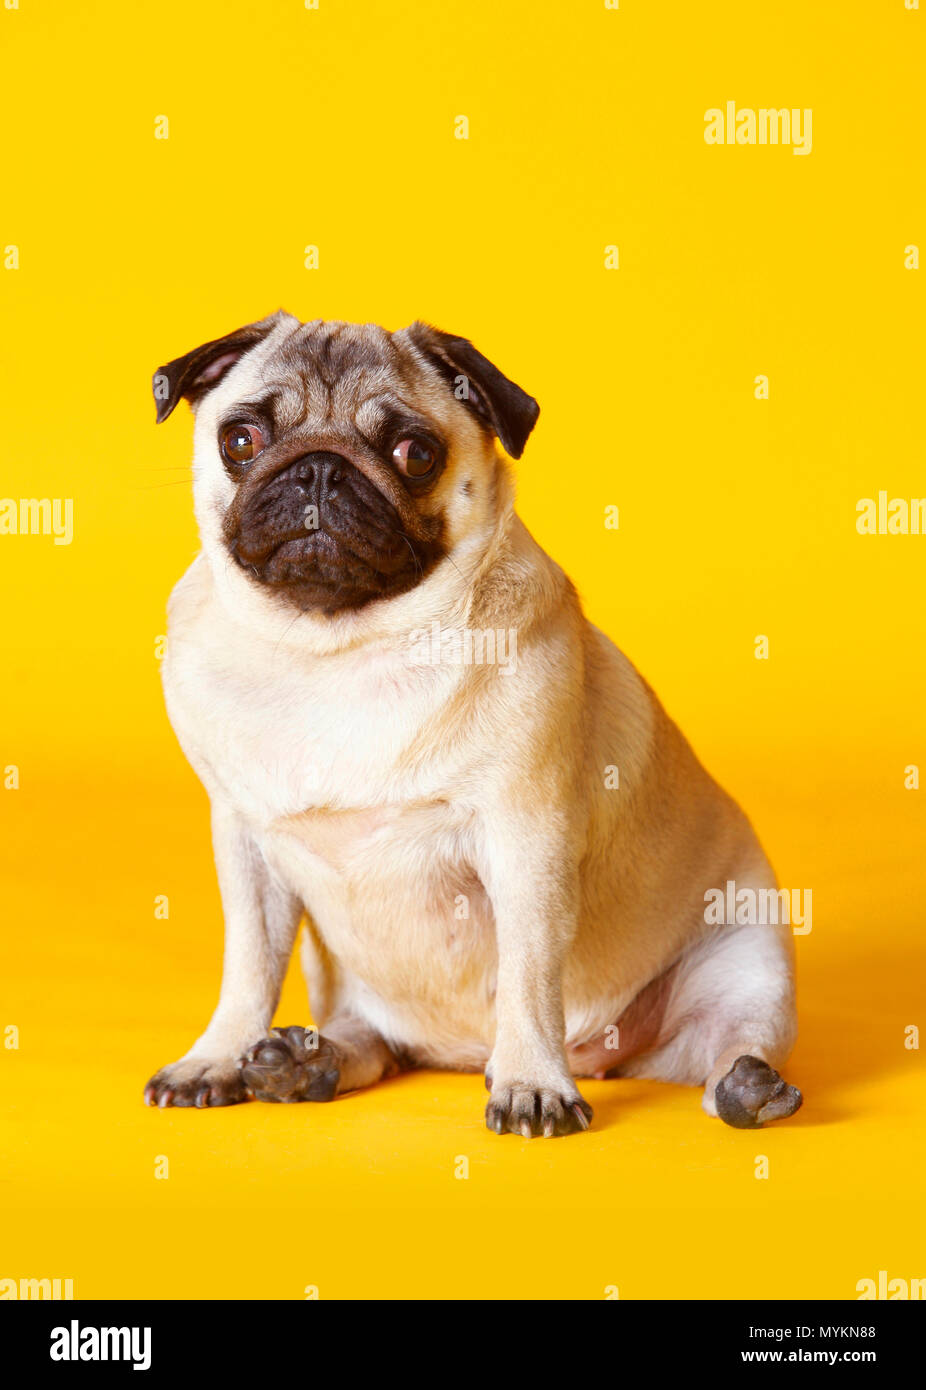 pug dog with yellow background in studio - Stock Image